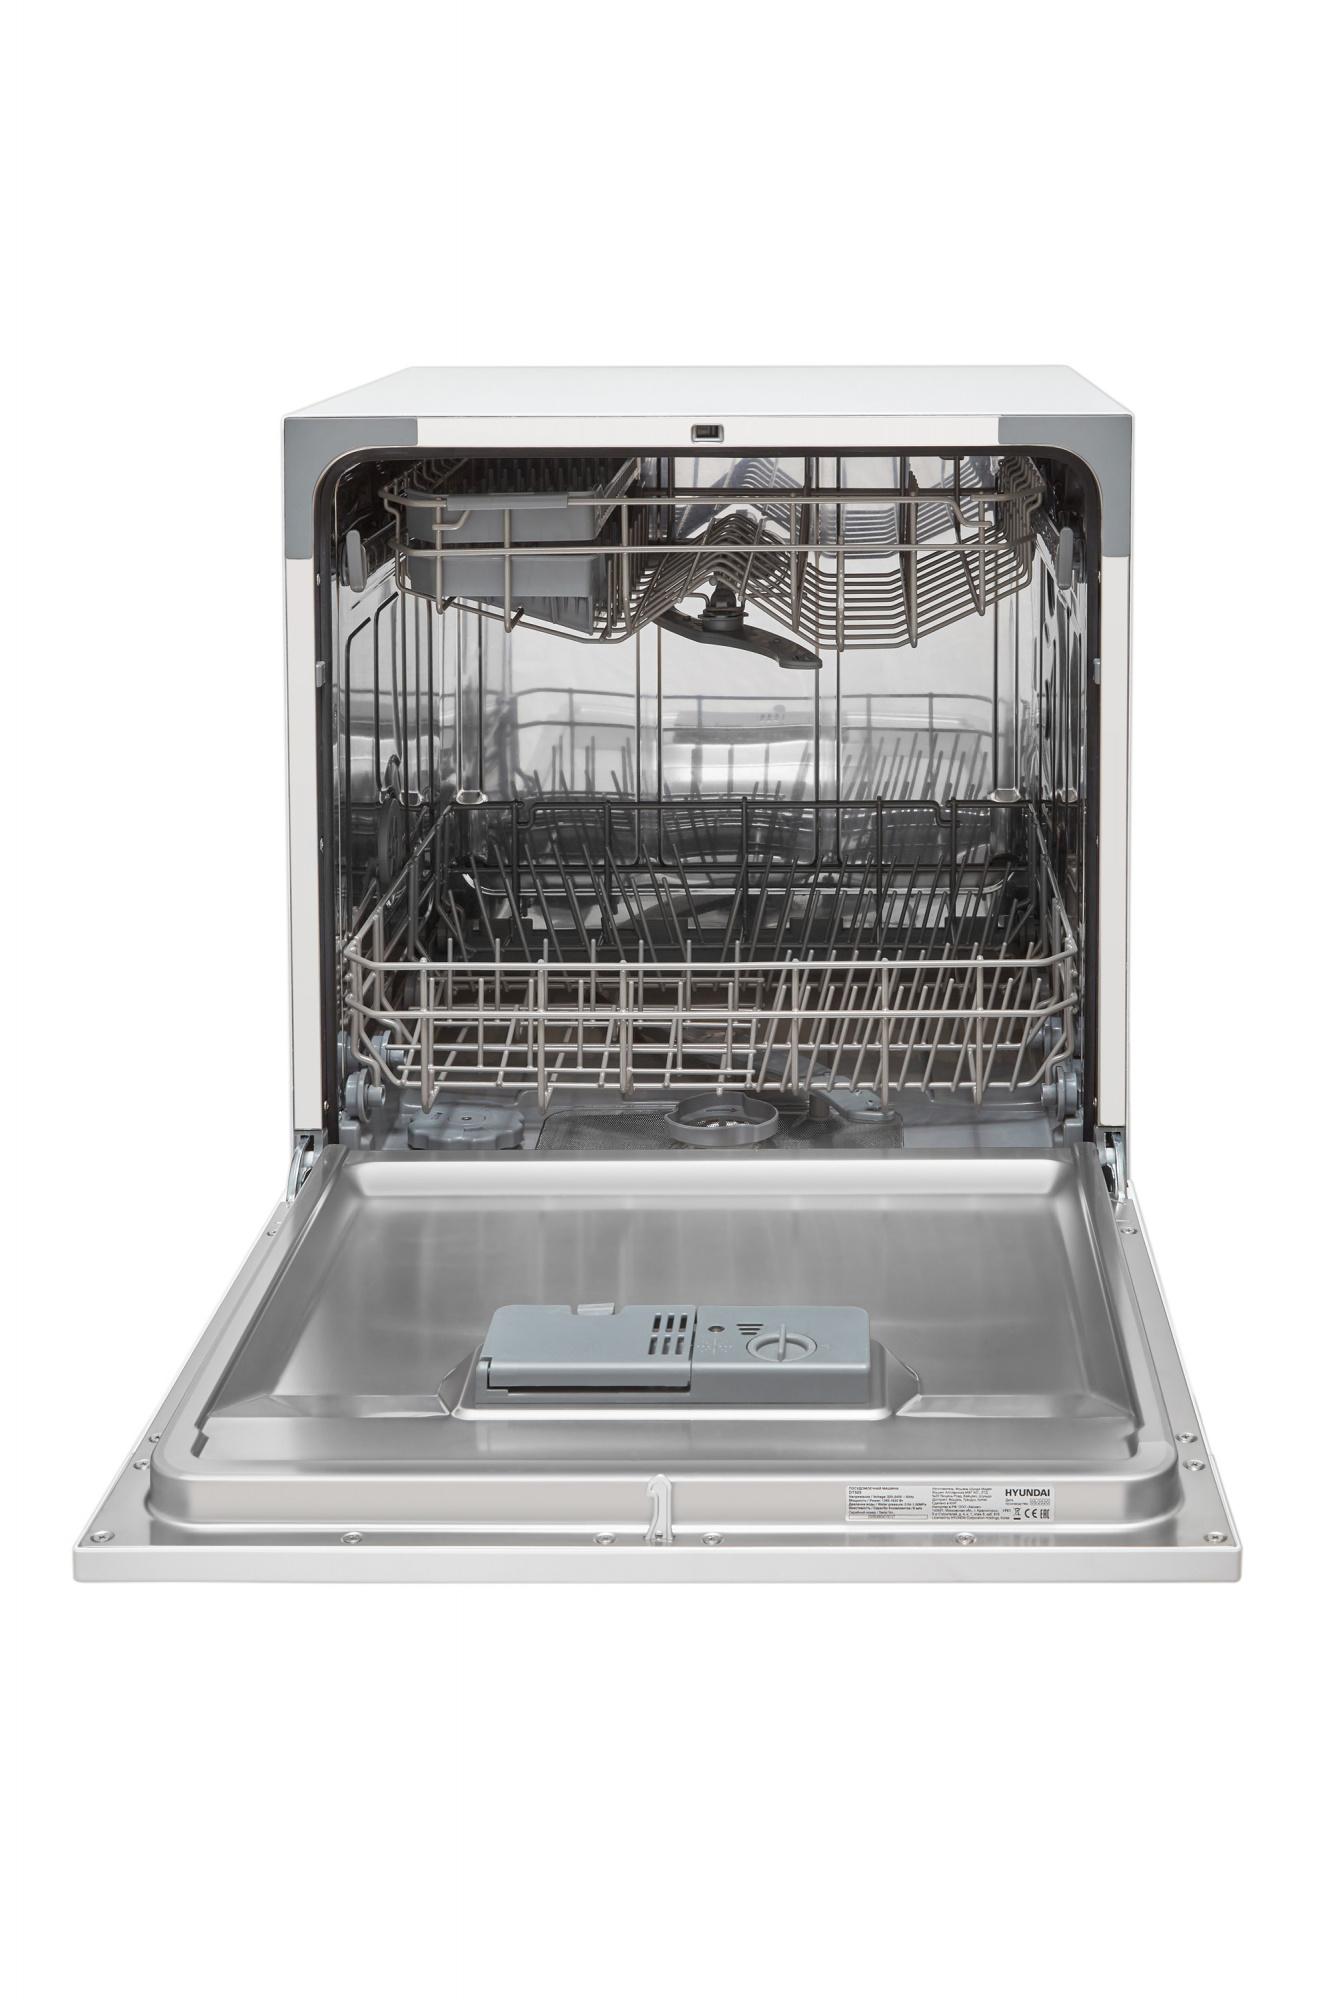 Посудомоечная машина Hyundai DT505 белый (компактная)